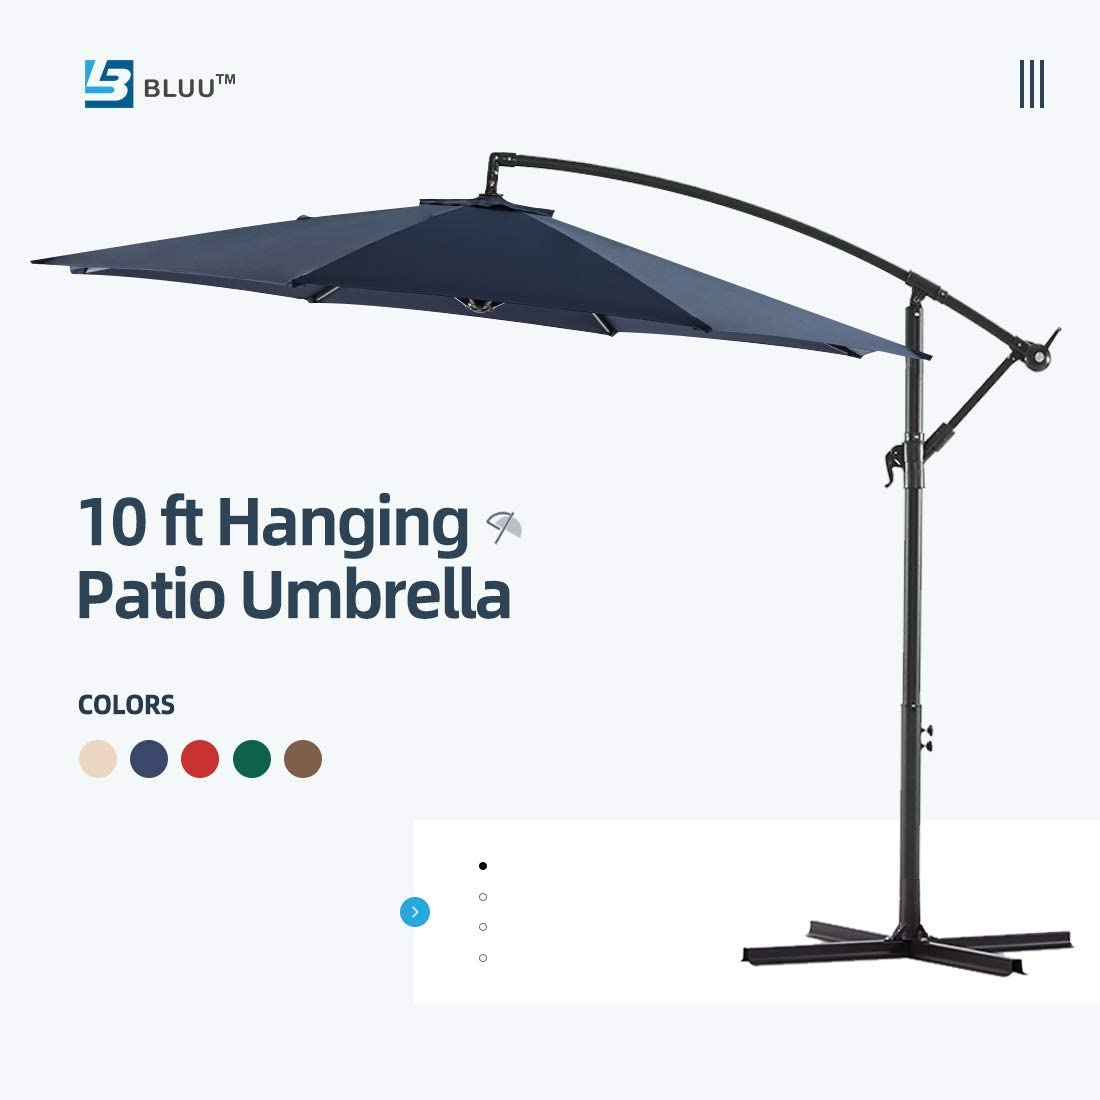 Brick Red WUFF Bluu 10ft Patio Offset Umbrella Cantilever Umbrella Hanging Market Umbrella Outdoor Umbrellas with Crank /& Cross Base